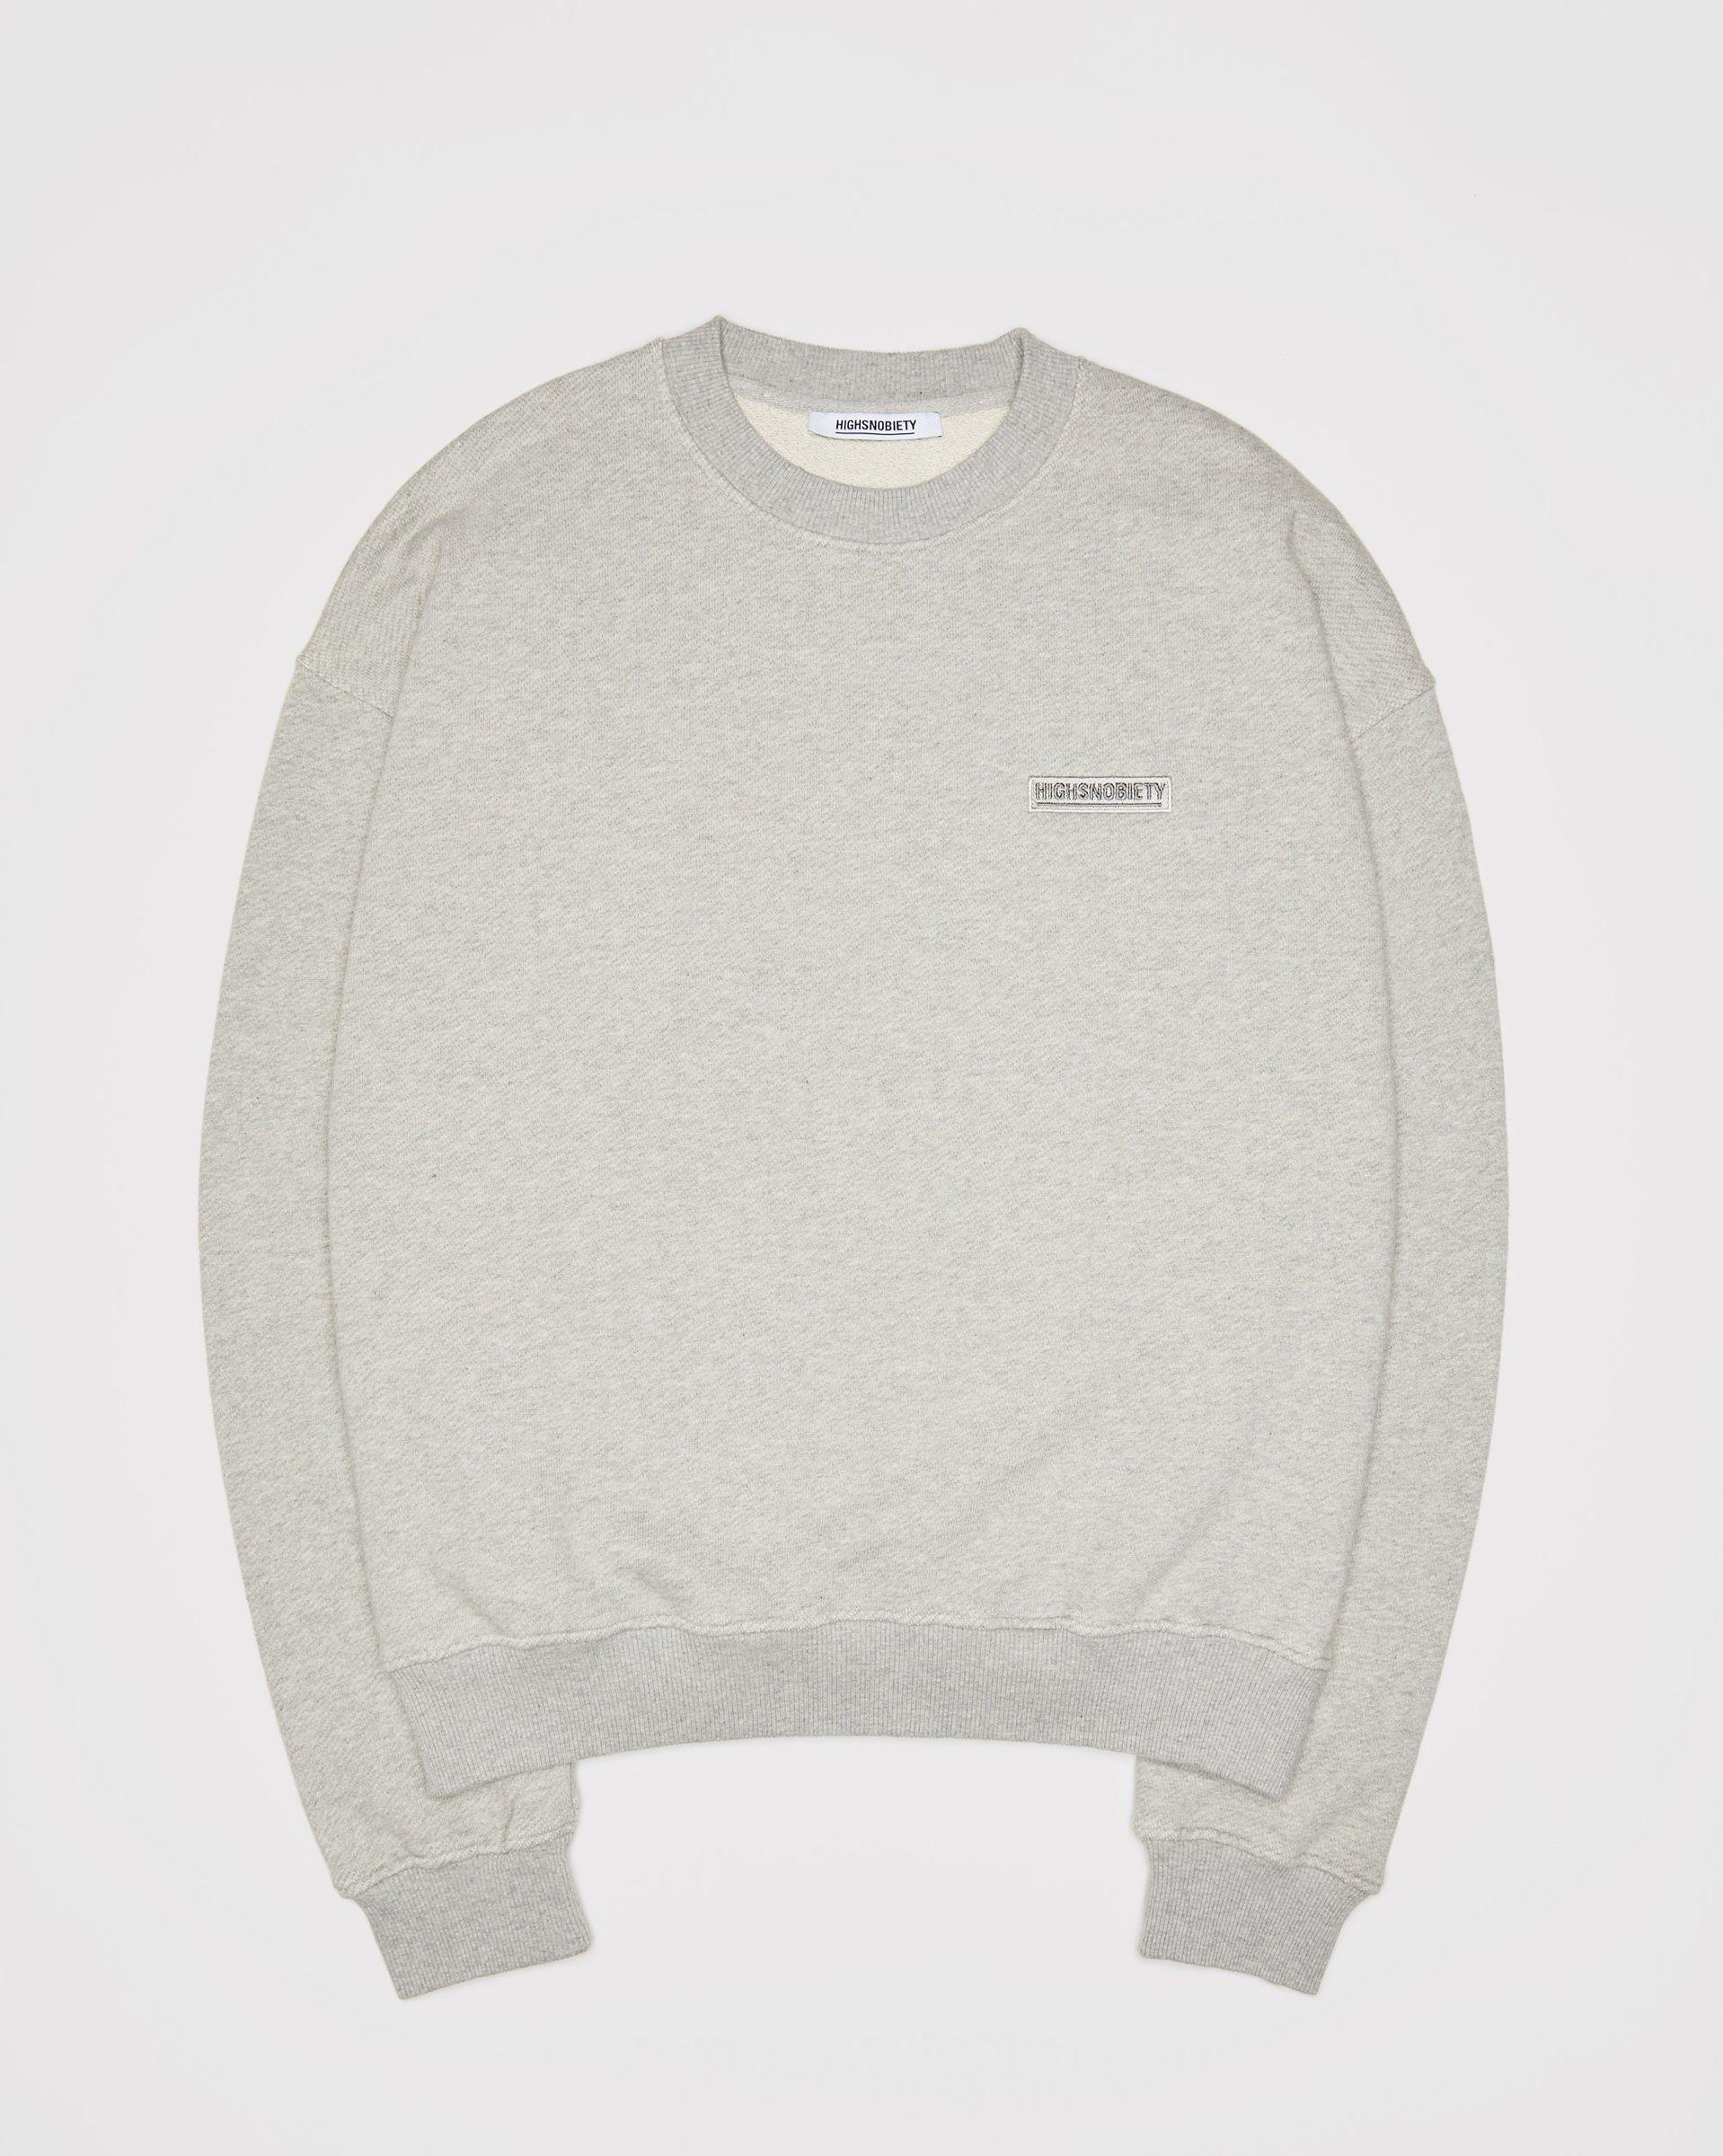 Highsnobiety Staples - Sweatshirt Grey - Image 1